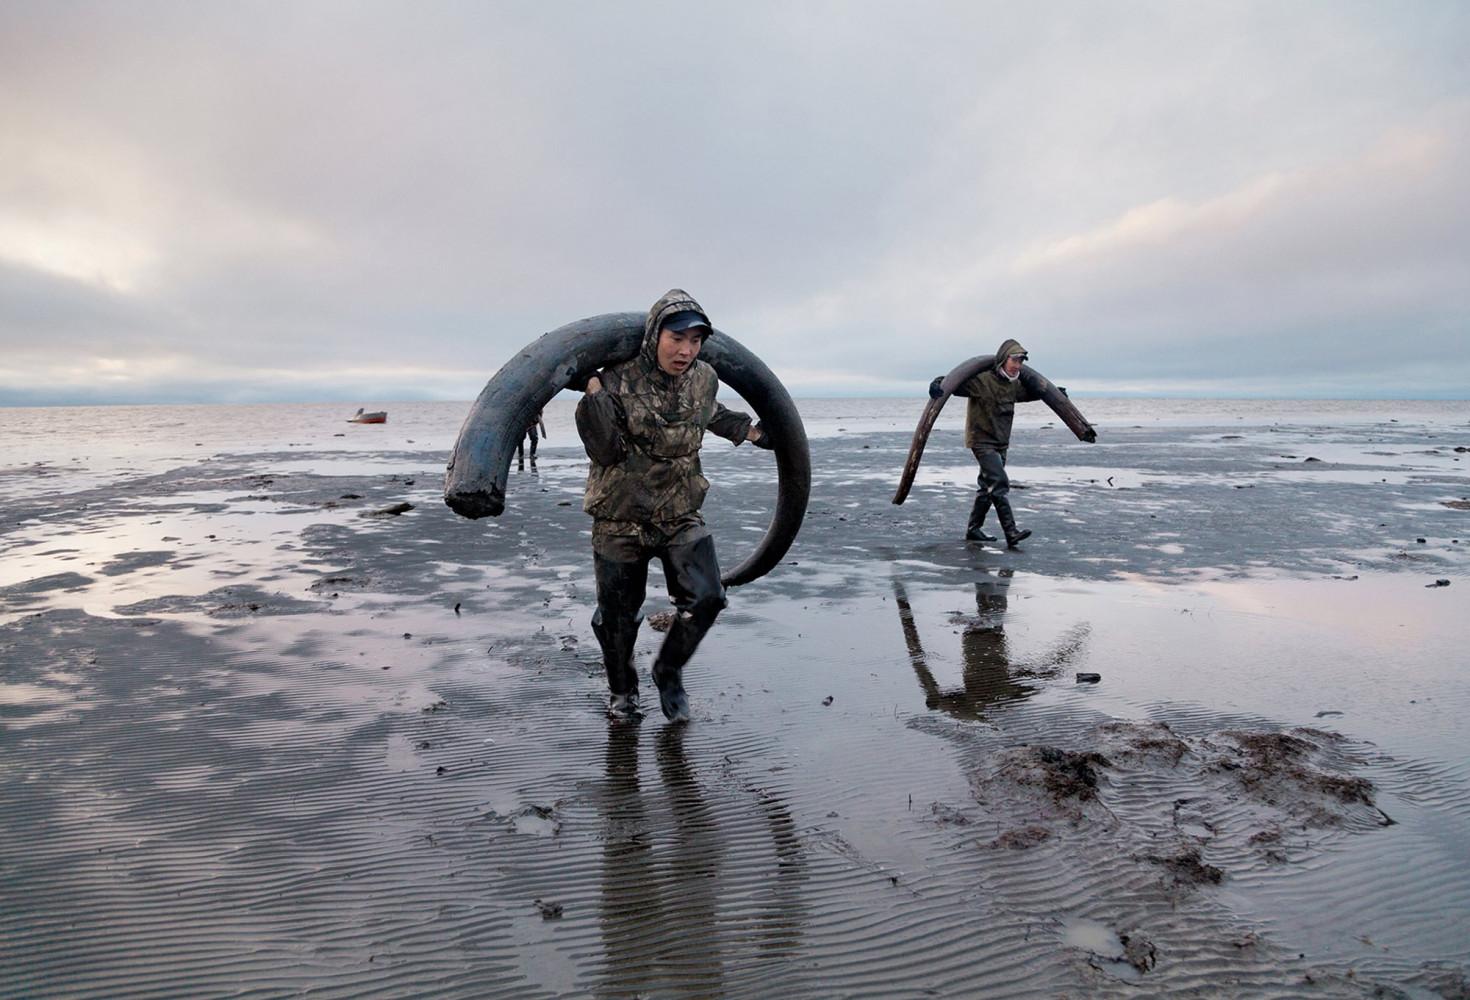 Mammoth Tusk Hunters photo by Evgenia Arbugaeva